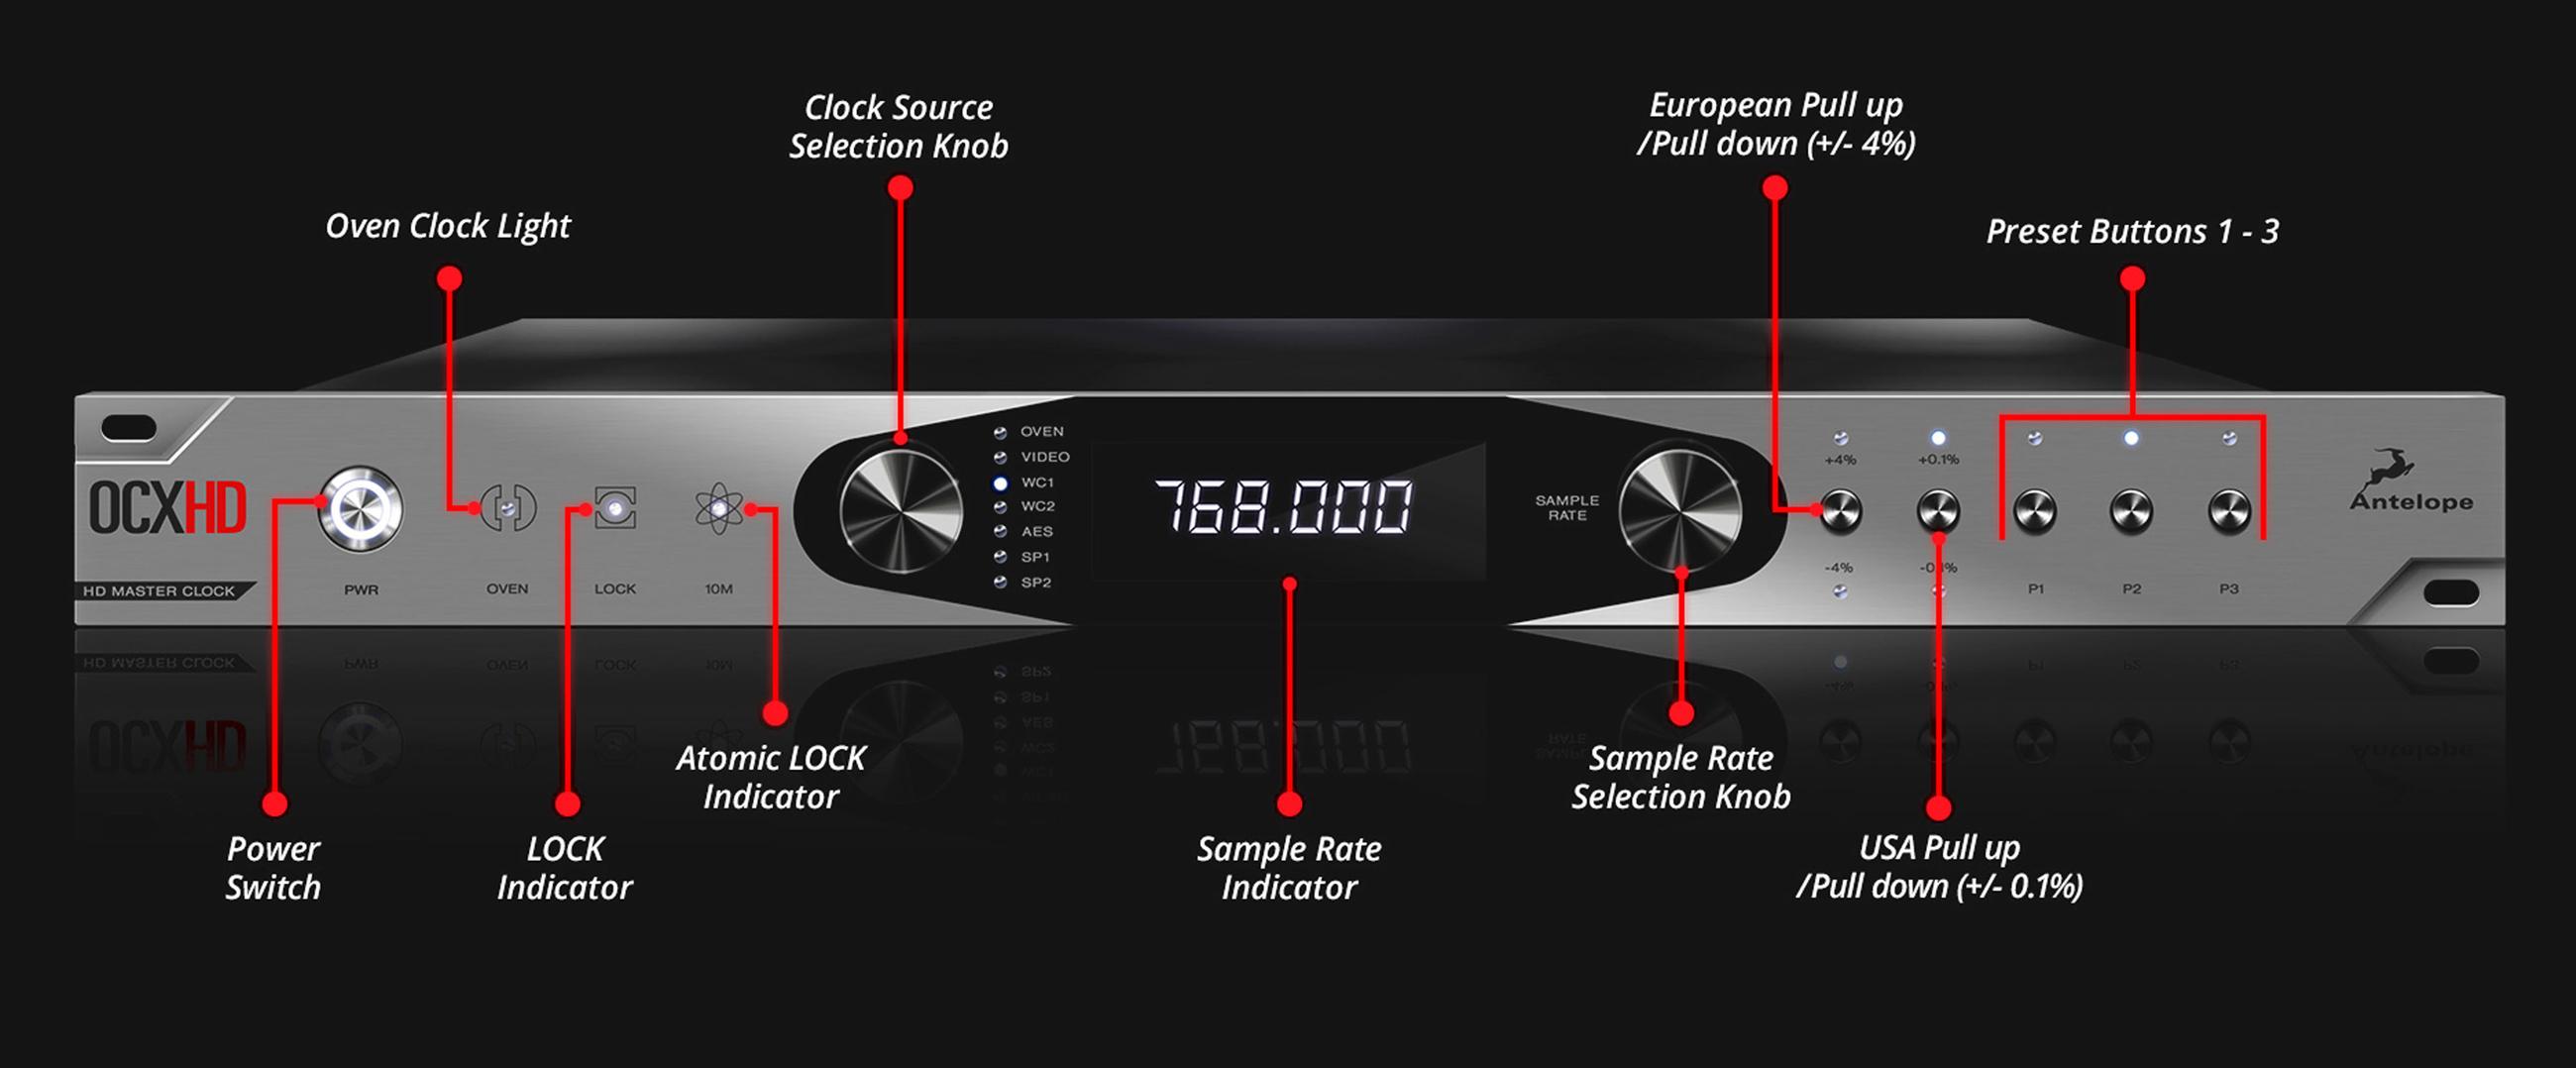 OCX HD 768 kHz HD Master Clock   Antelope Audio